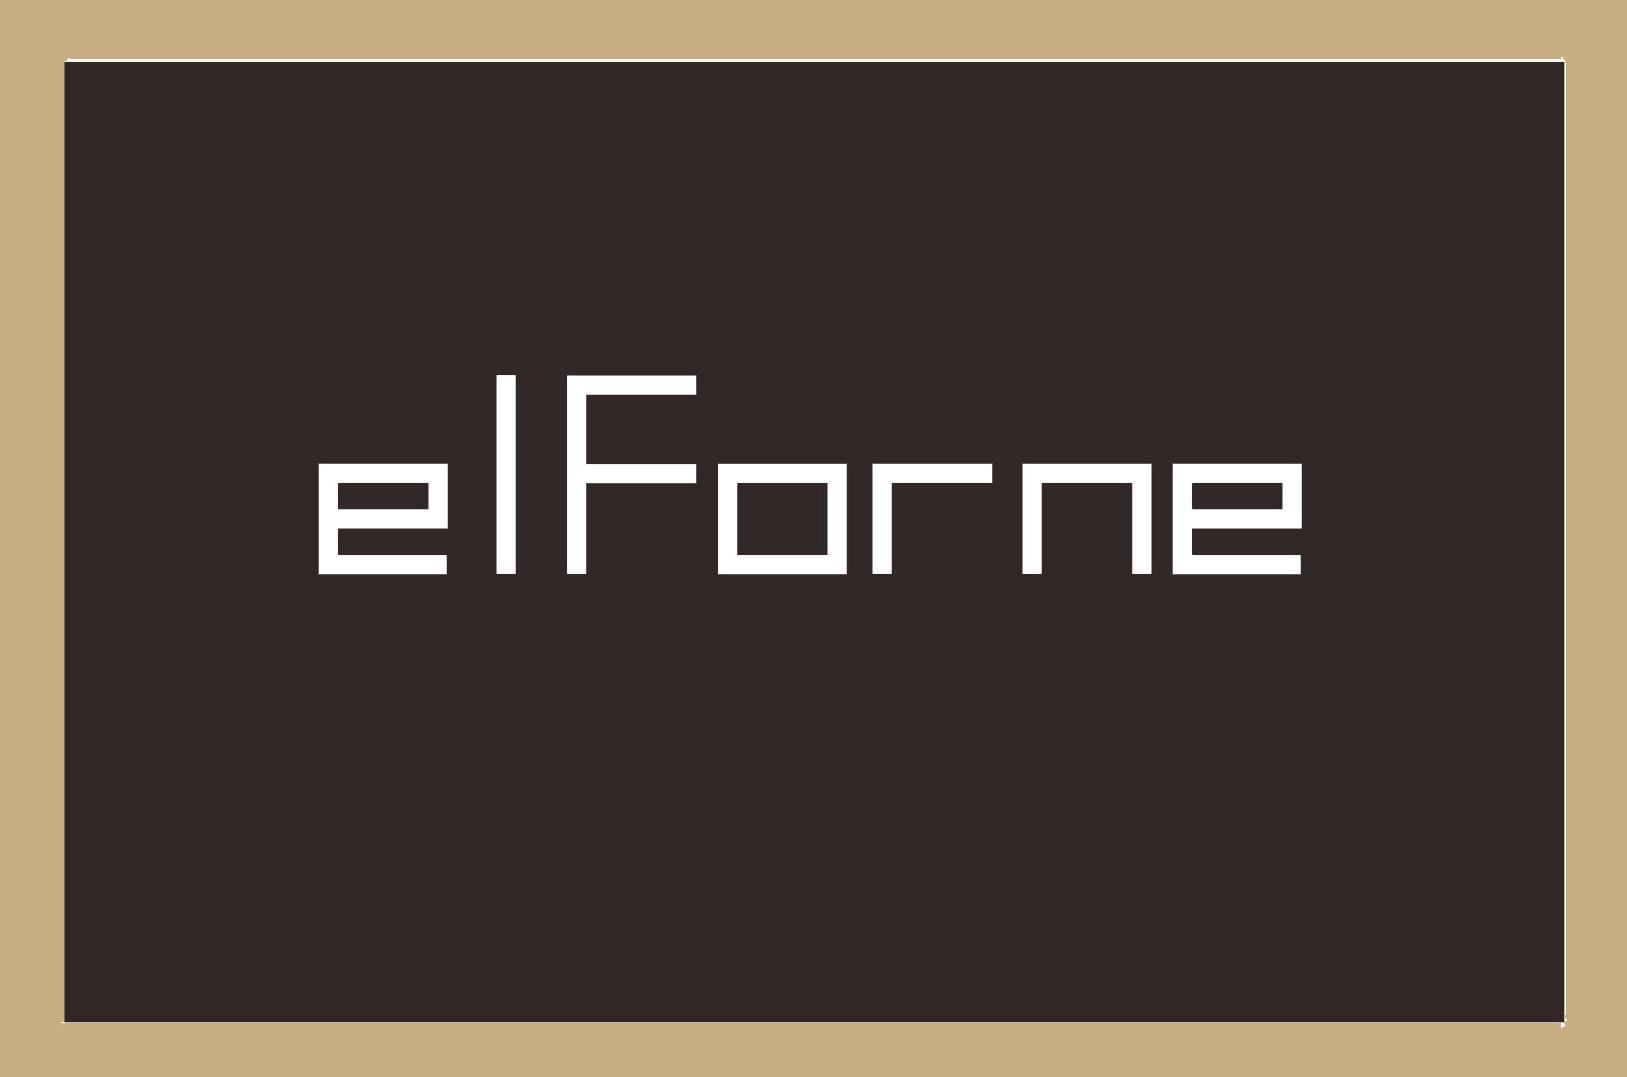 El Forne